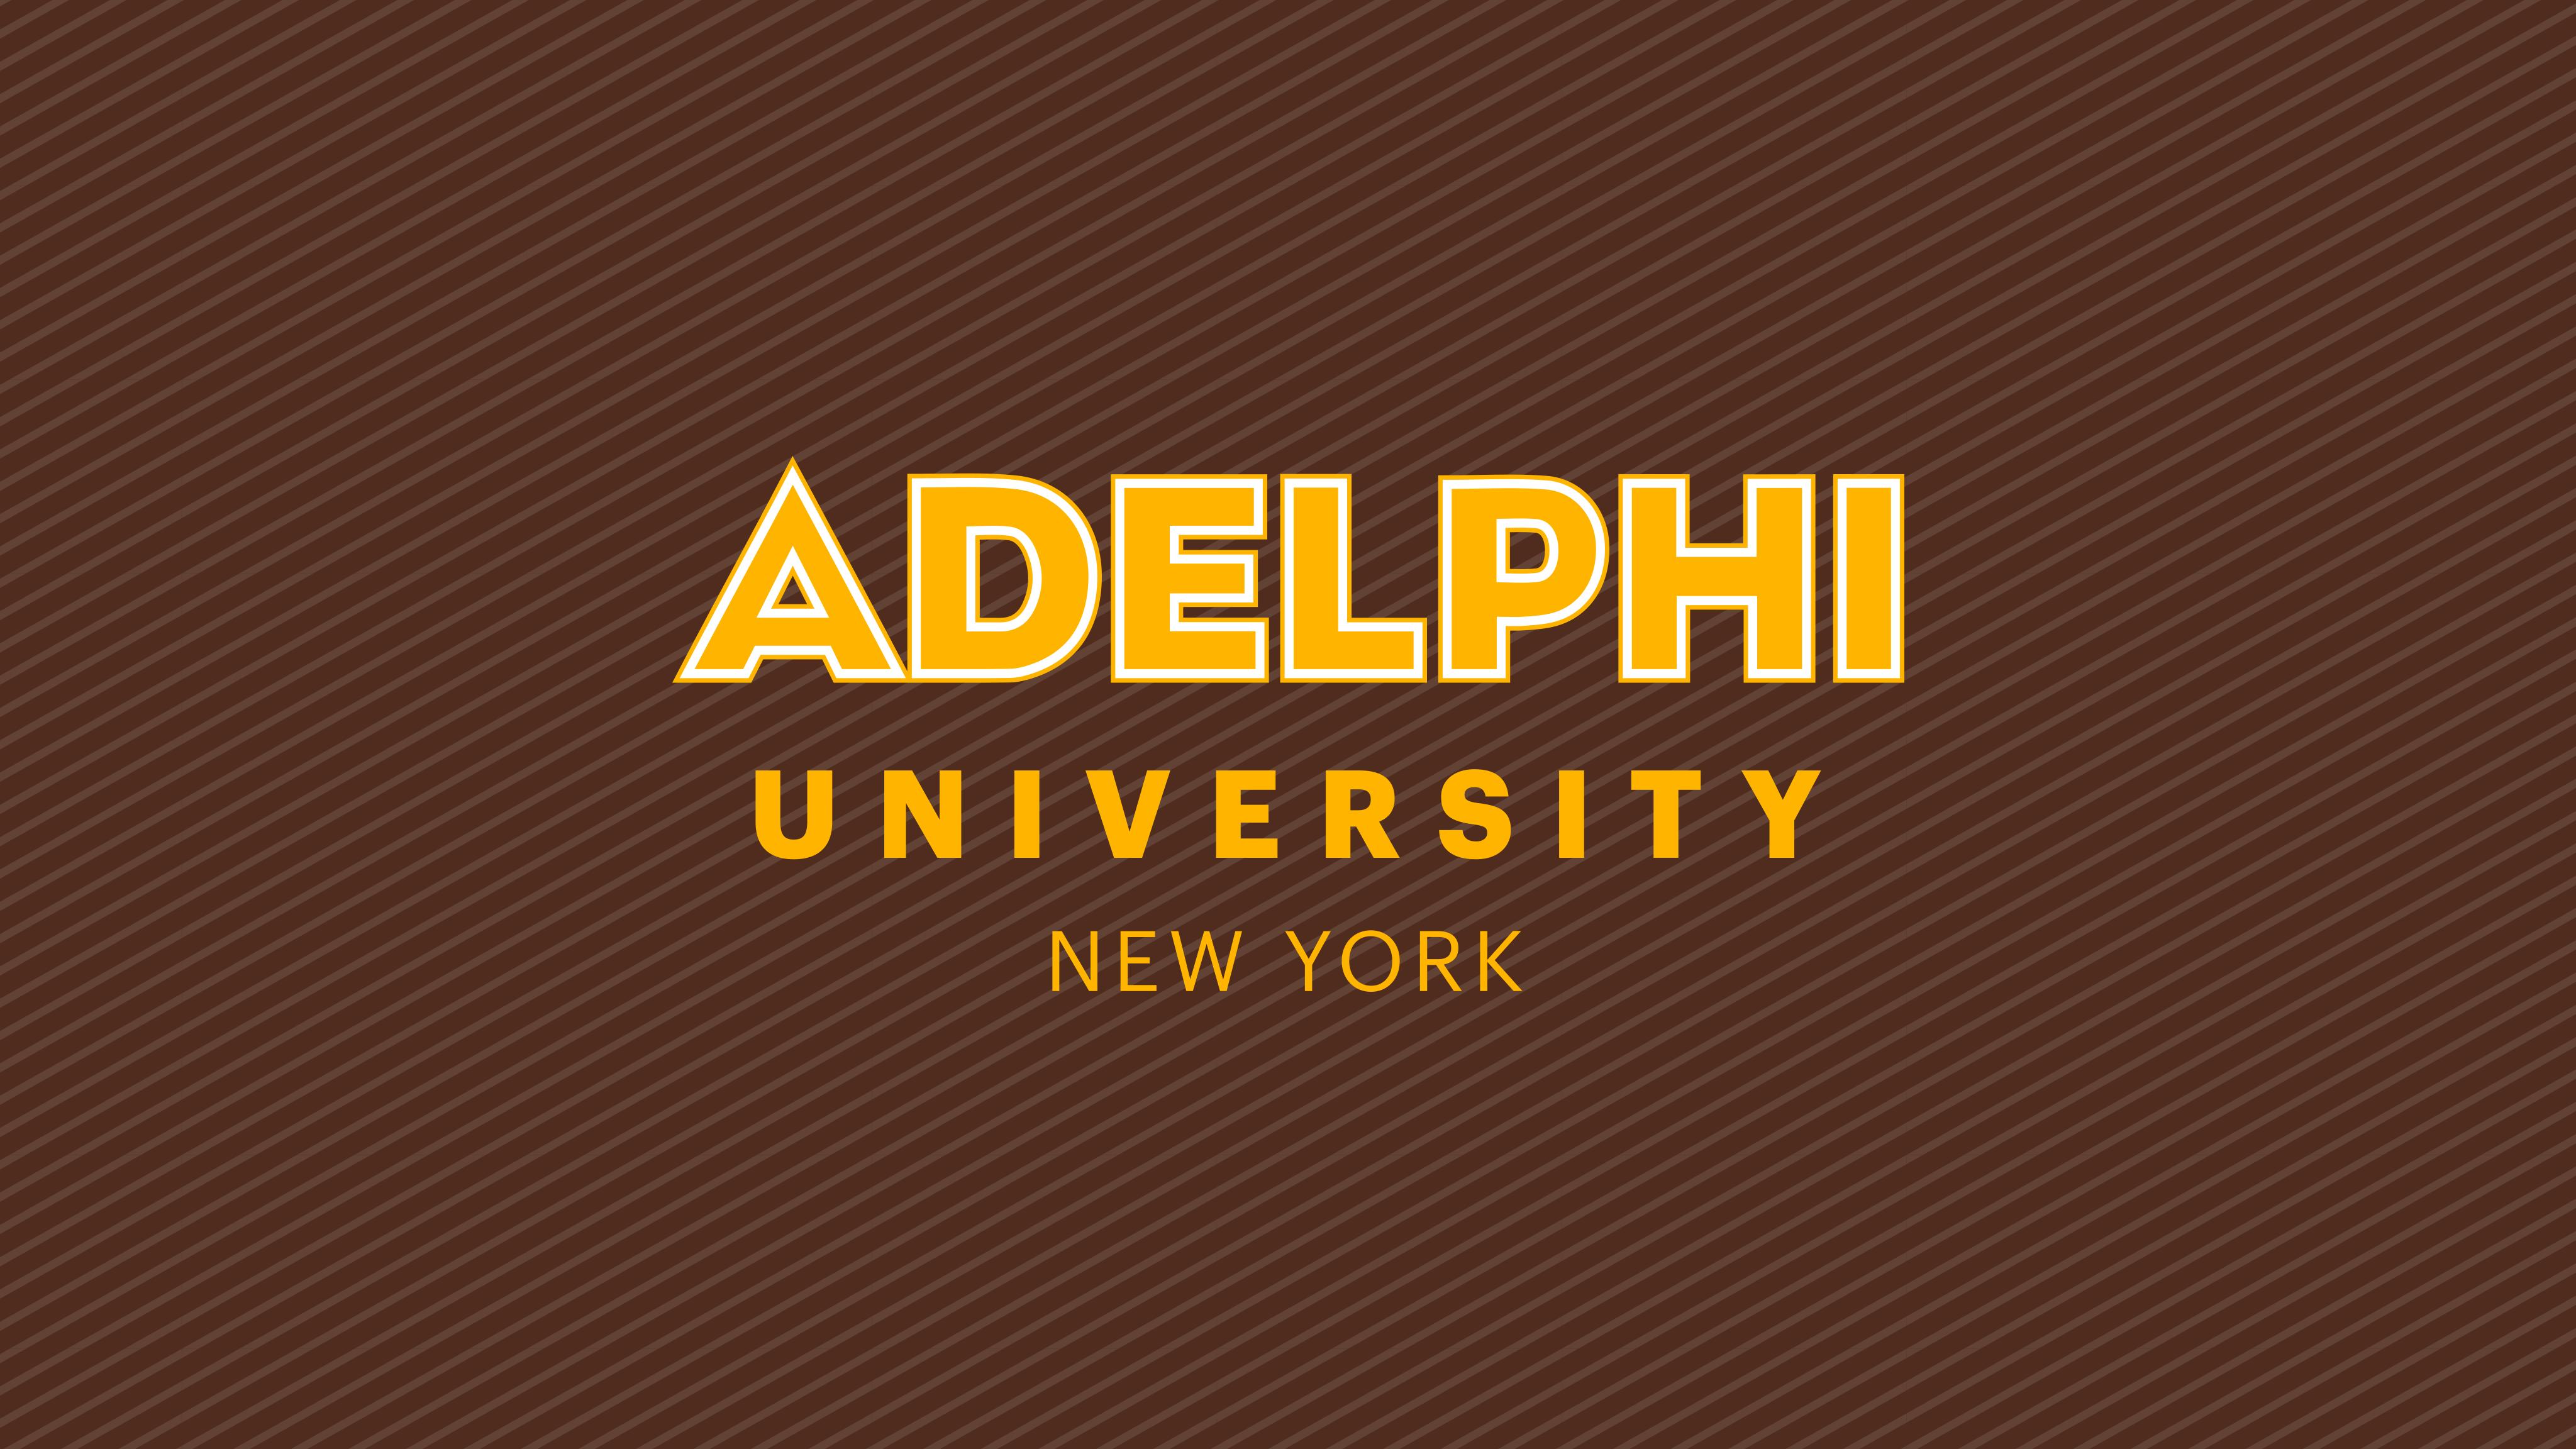 Desktop 16x9 - Adelphi Brown Wallpaper